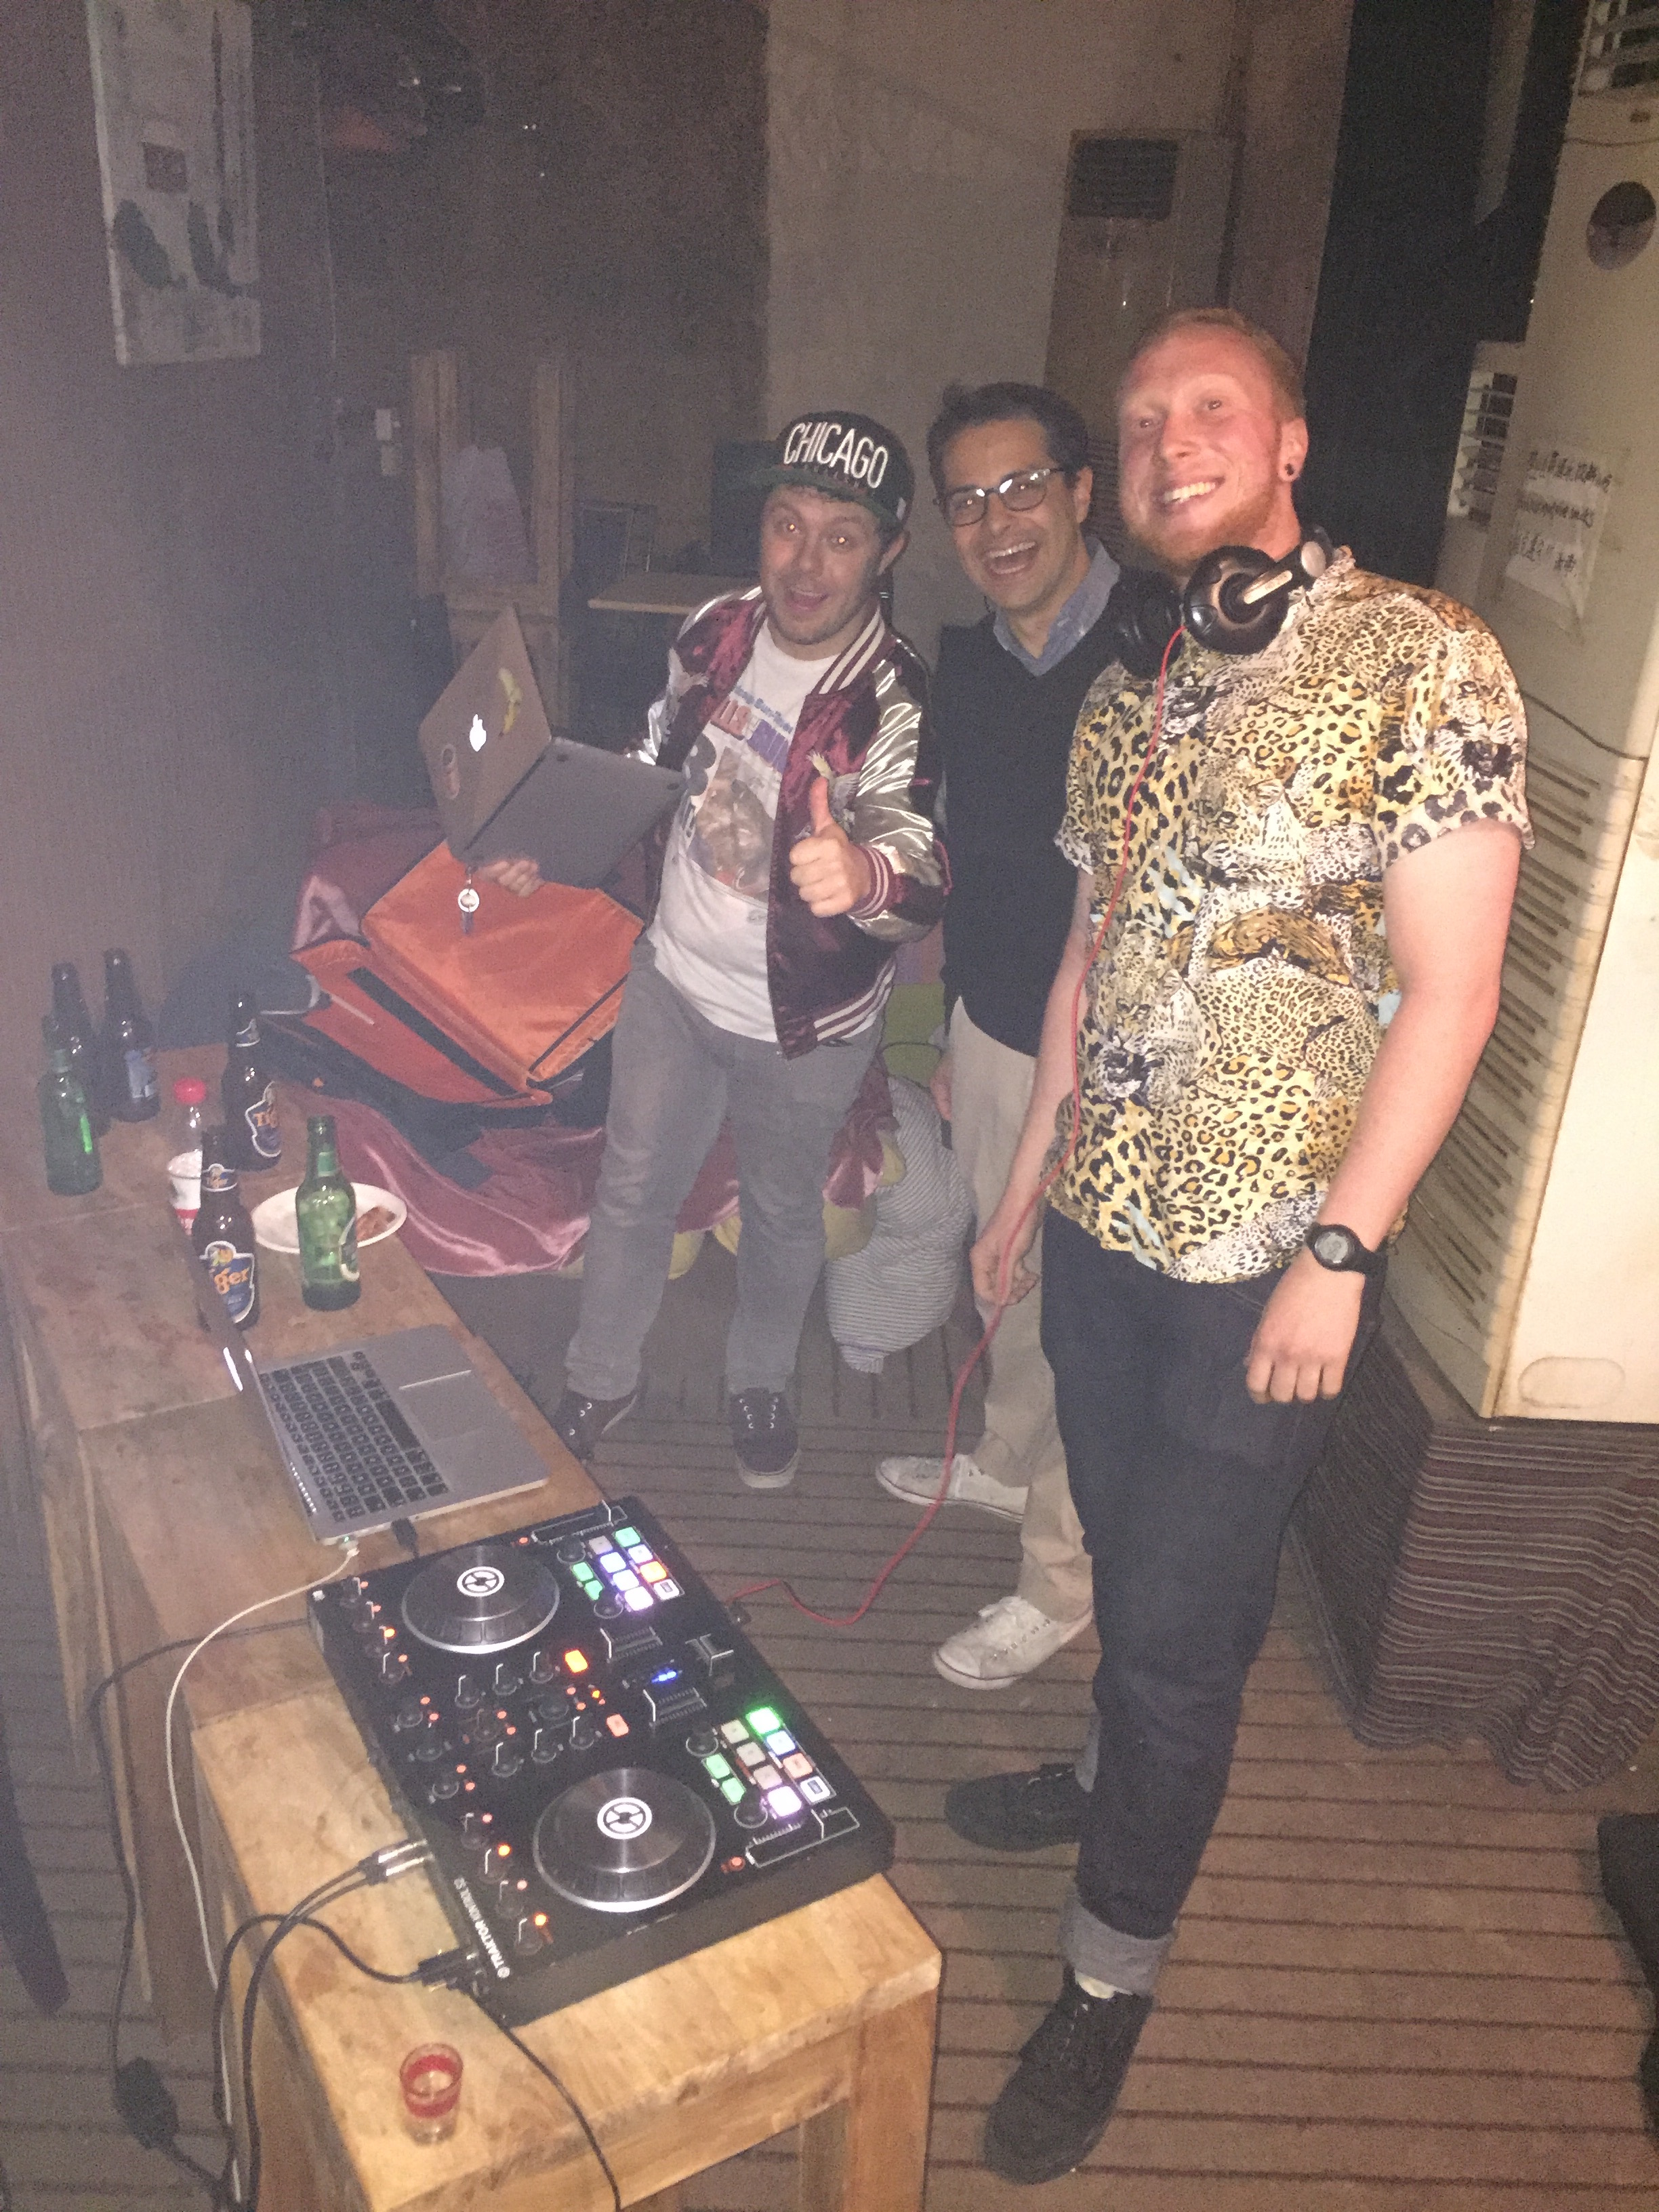 Club Paradise DJs at Loreli's 1 year anniversary party